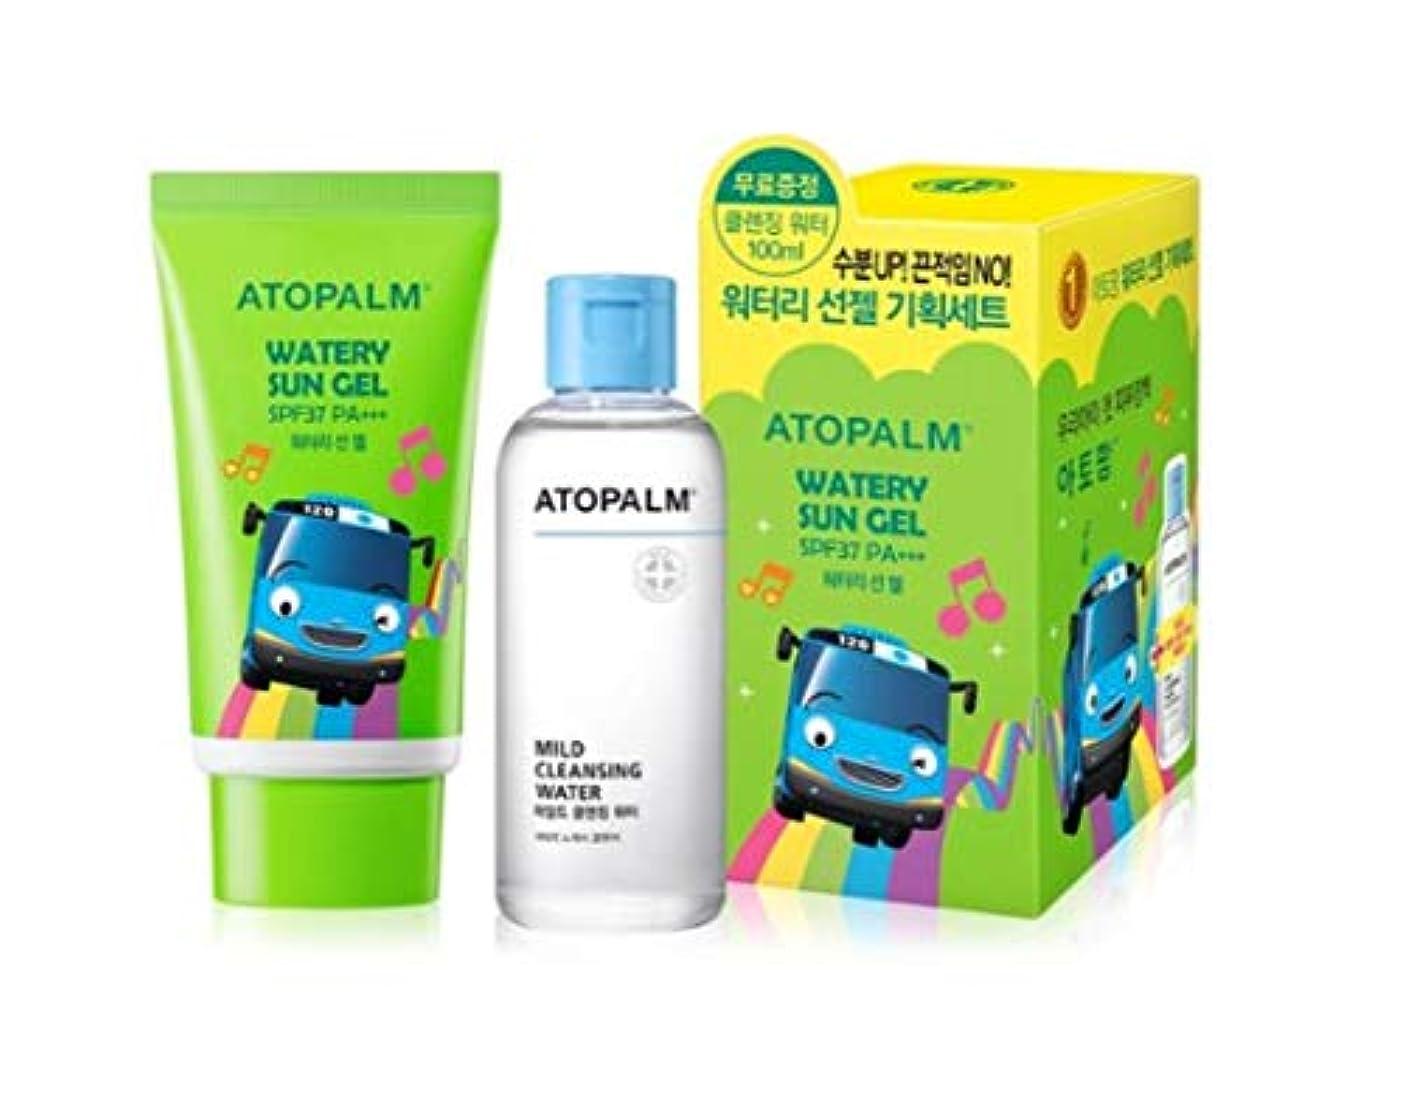 ATOPALM OUTDOOR Mild Sun Cream(EWG all green grade!)+ Cleansing Water100ml SPF32+ PA+++日焼け止めパーフェクトUVネック?手?足の甲?...